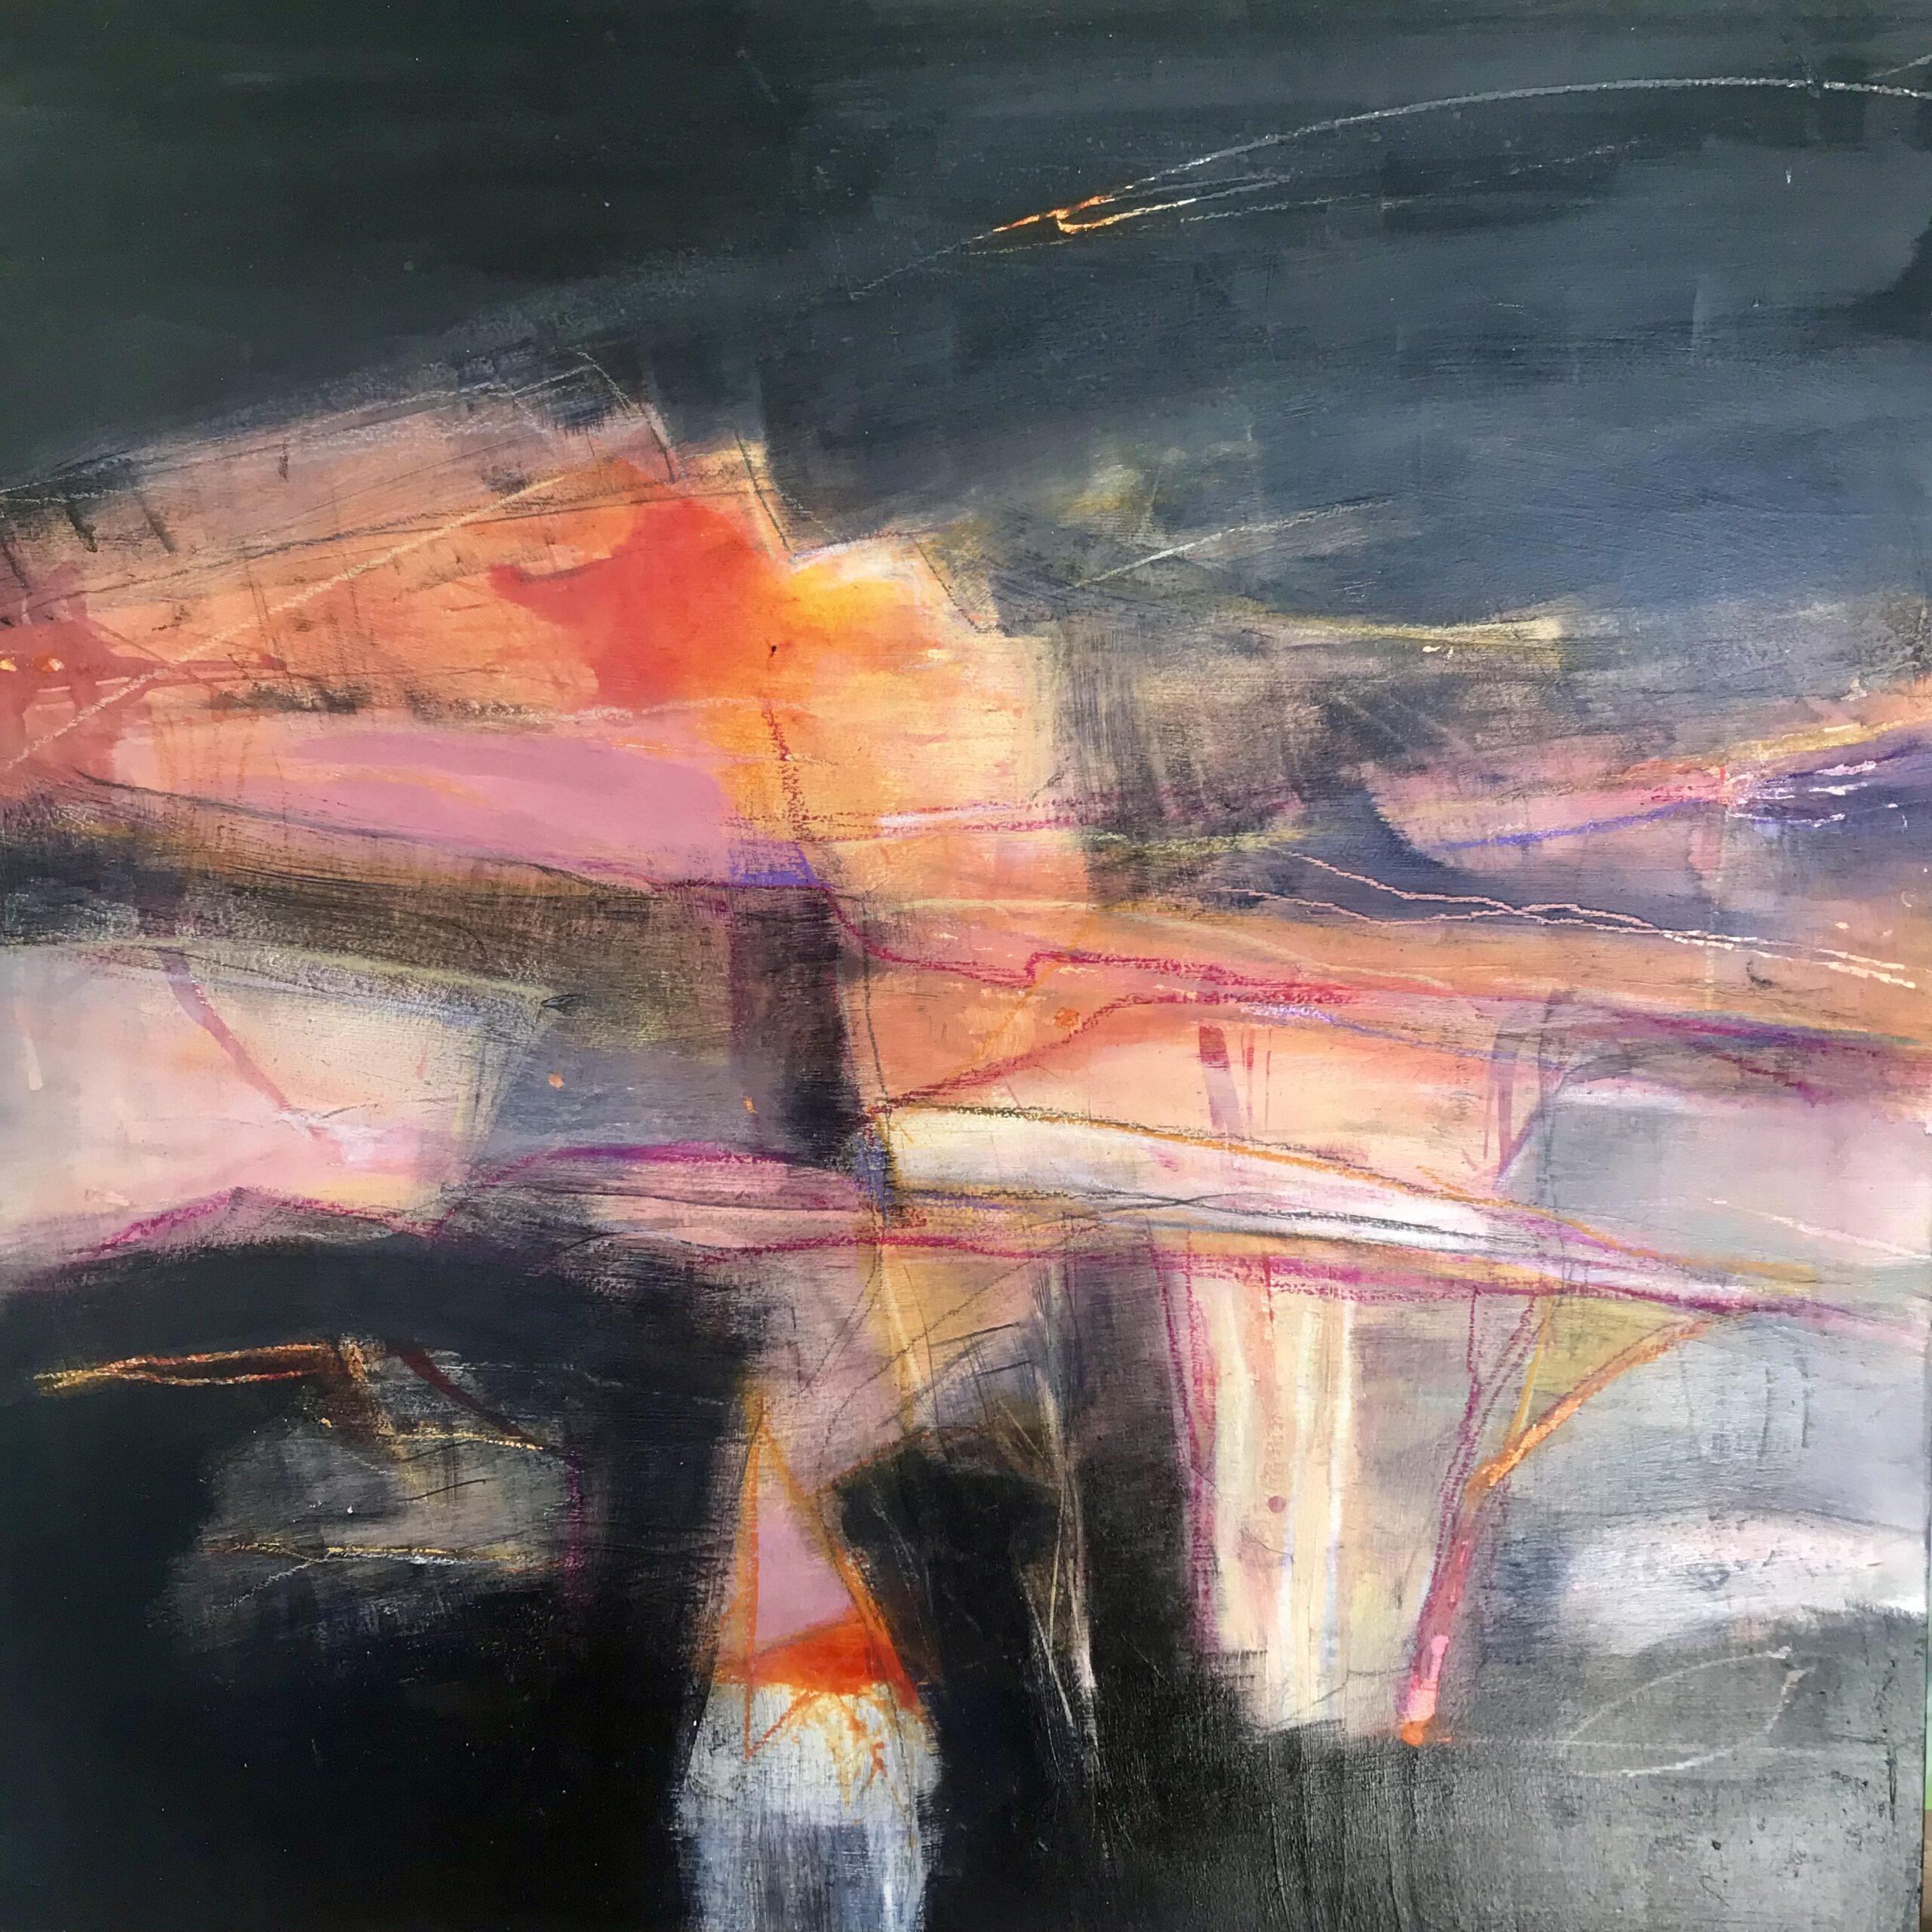 Annie Green, Sun's fiery kiss, mixed media on board,- 44x44cm framed